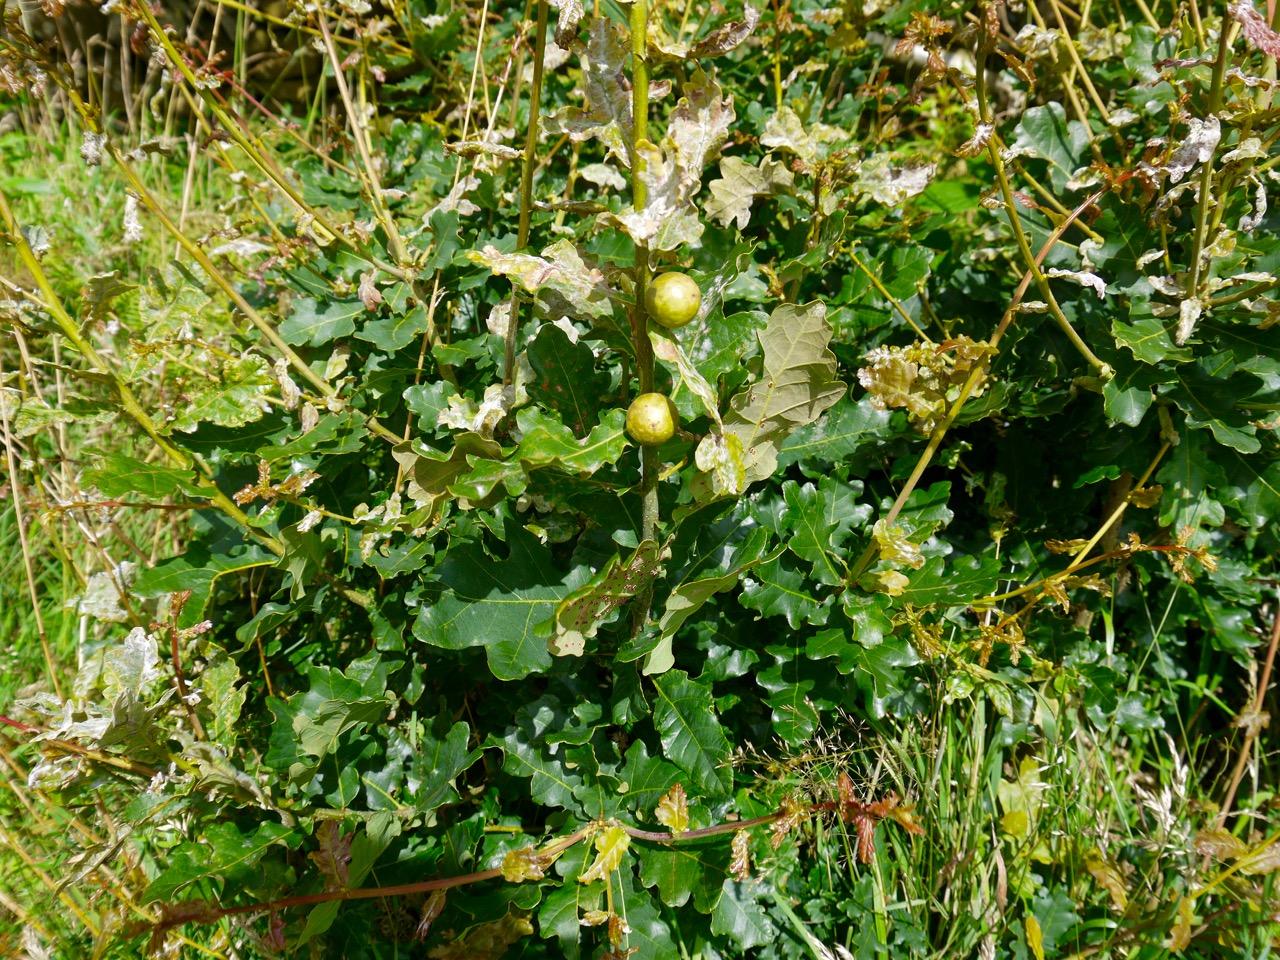 Oak Marbles (wasp larvae)